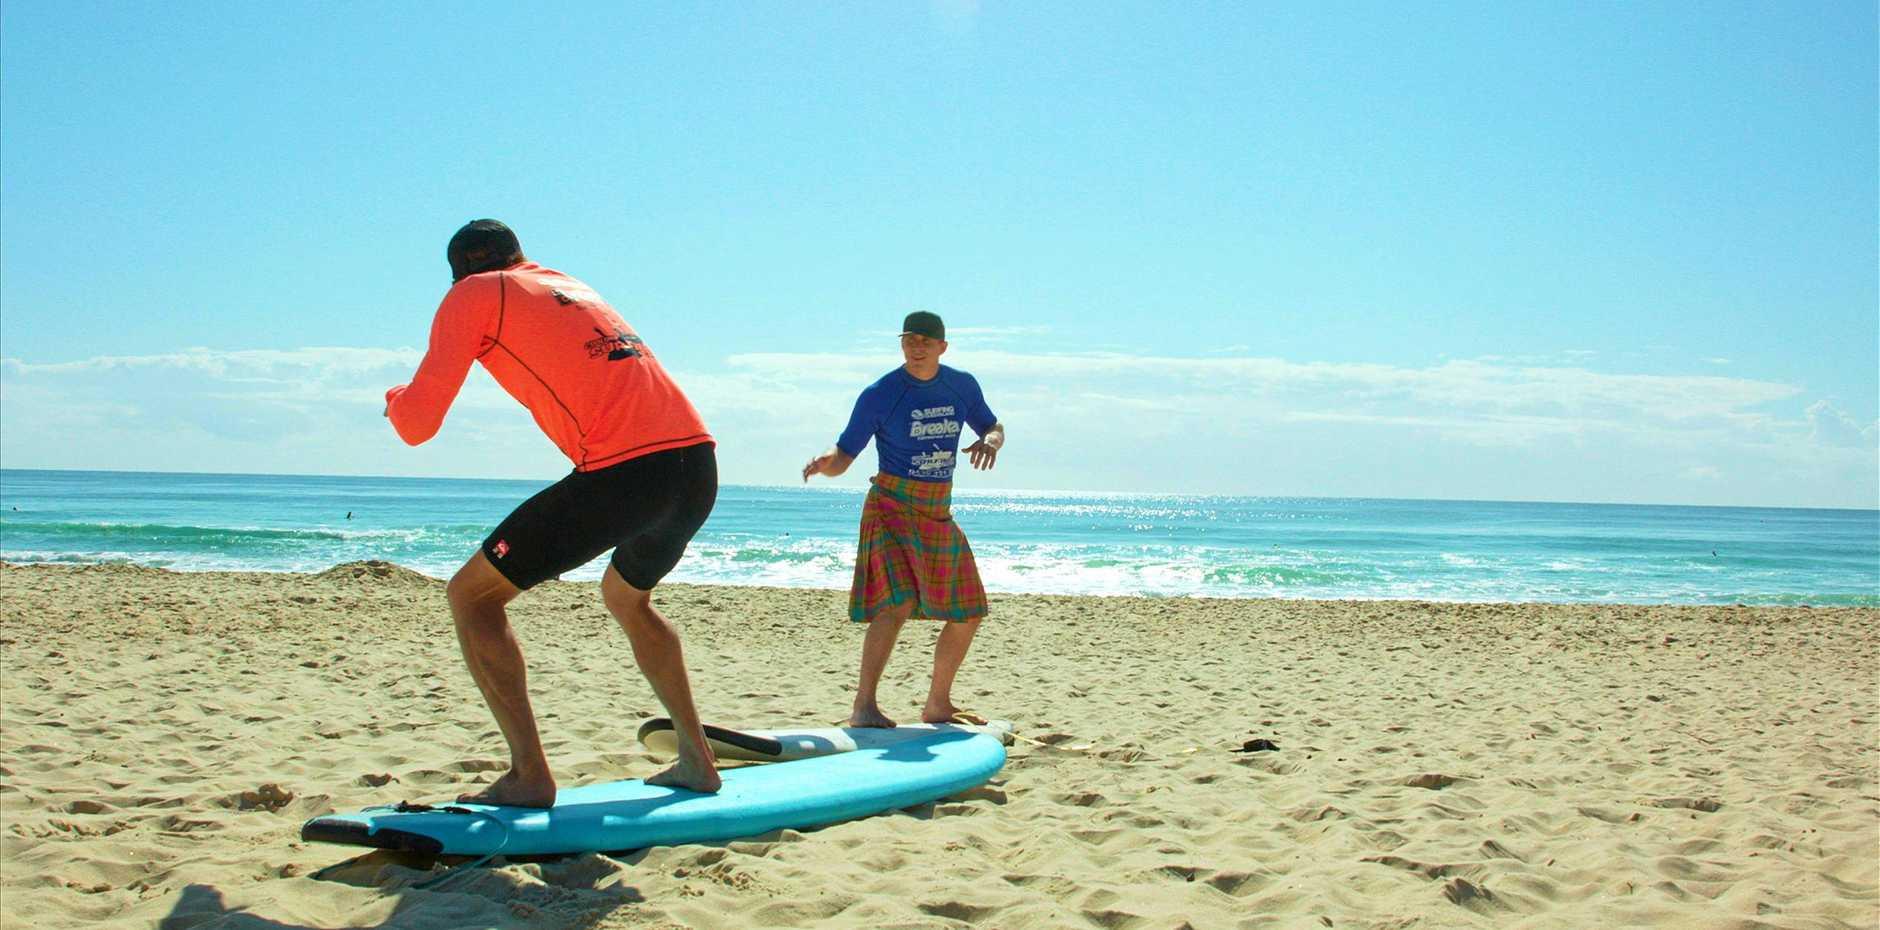 Euan Burton learns how to surf on the Sunshine Coast.